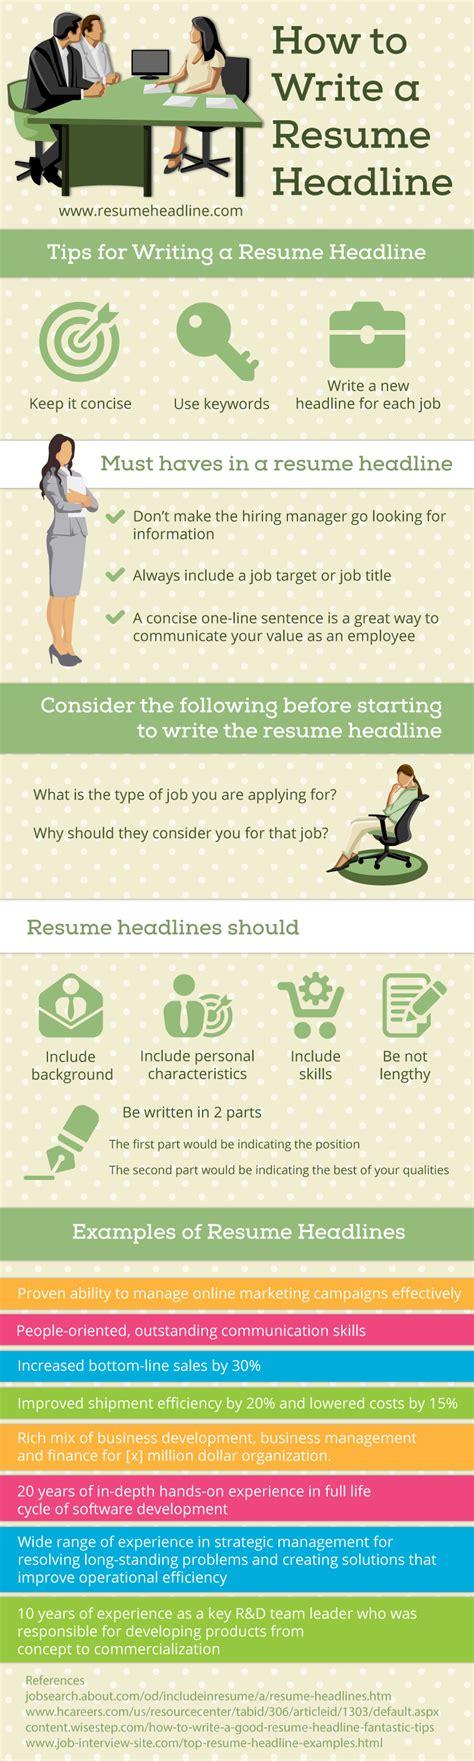 writing a resume headline resume title